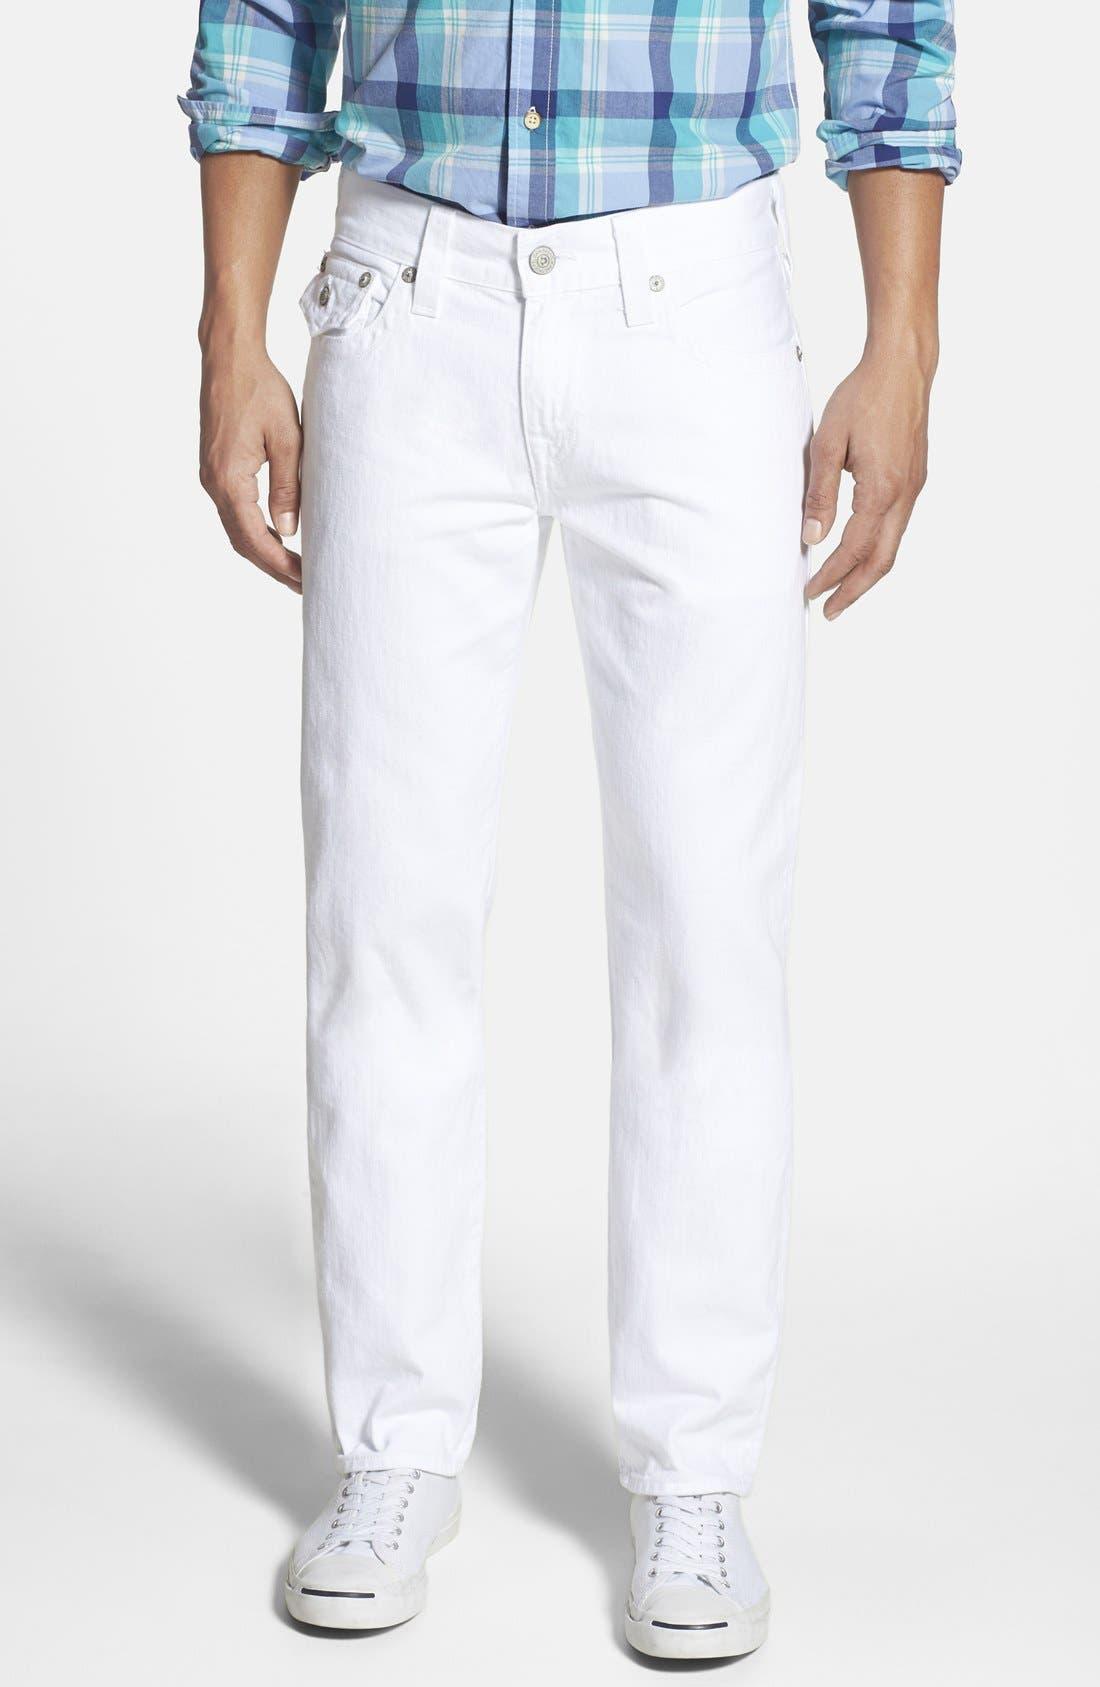 Main Image - True Religion Brand Jeans 'Geno' Straight Leg Jeans (Optic White)